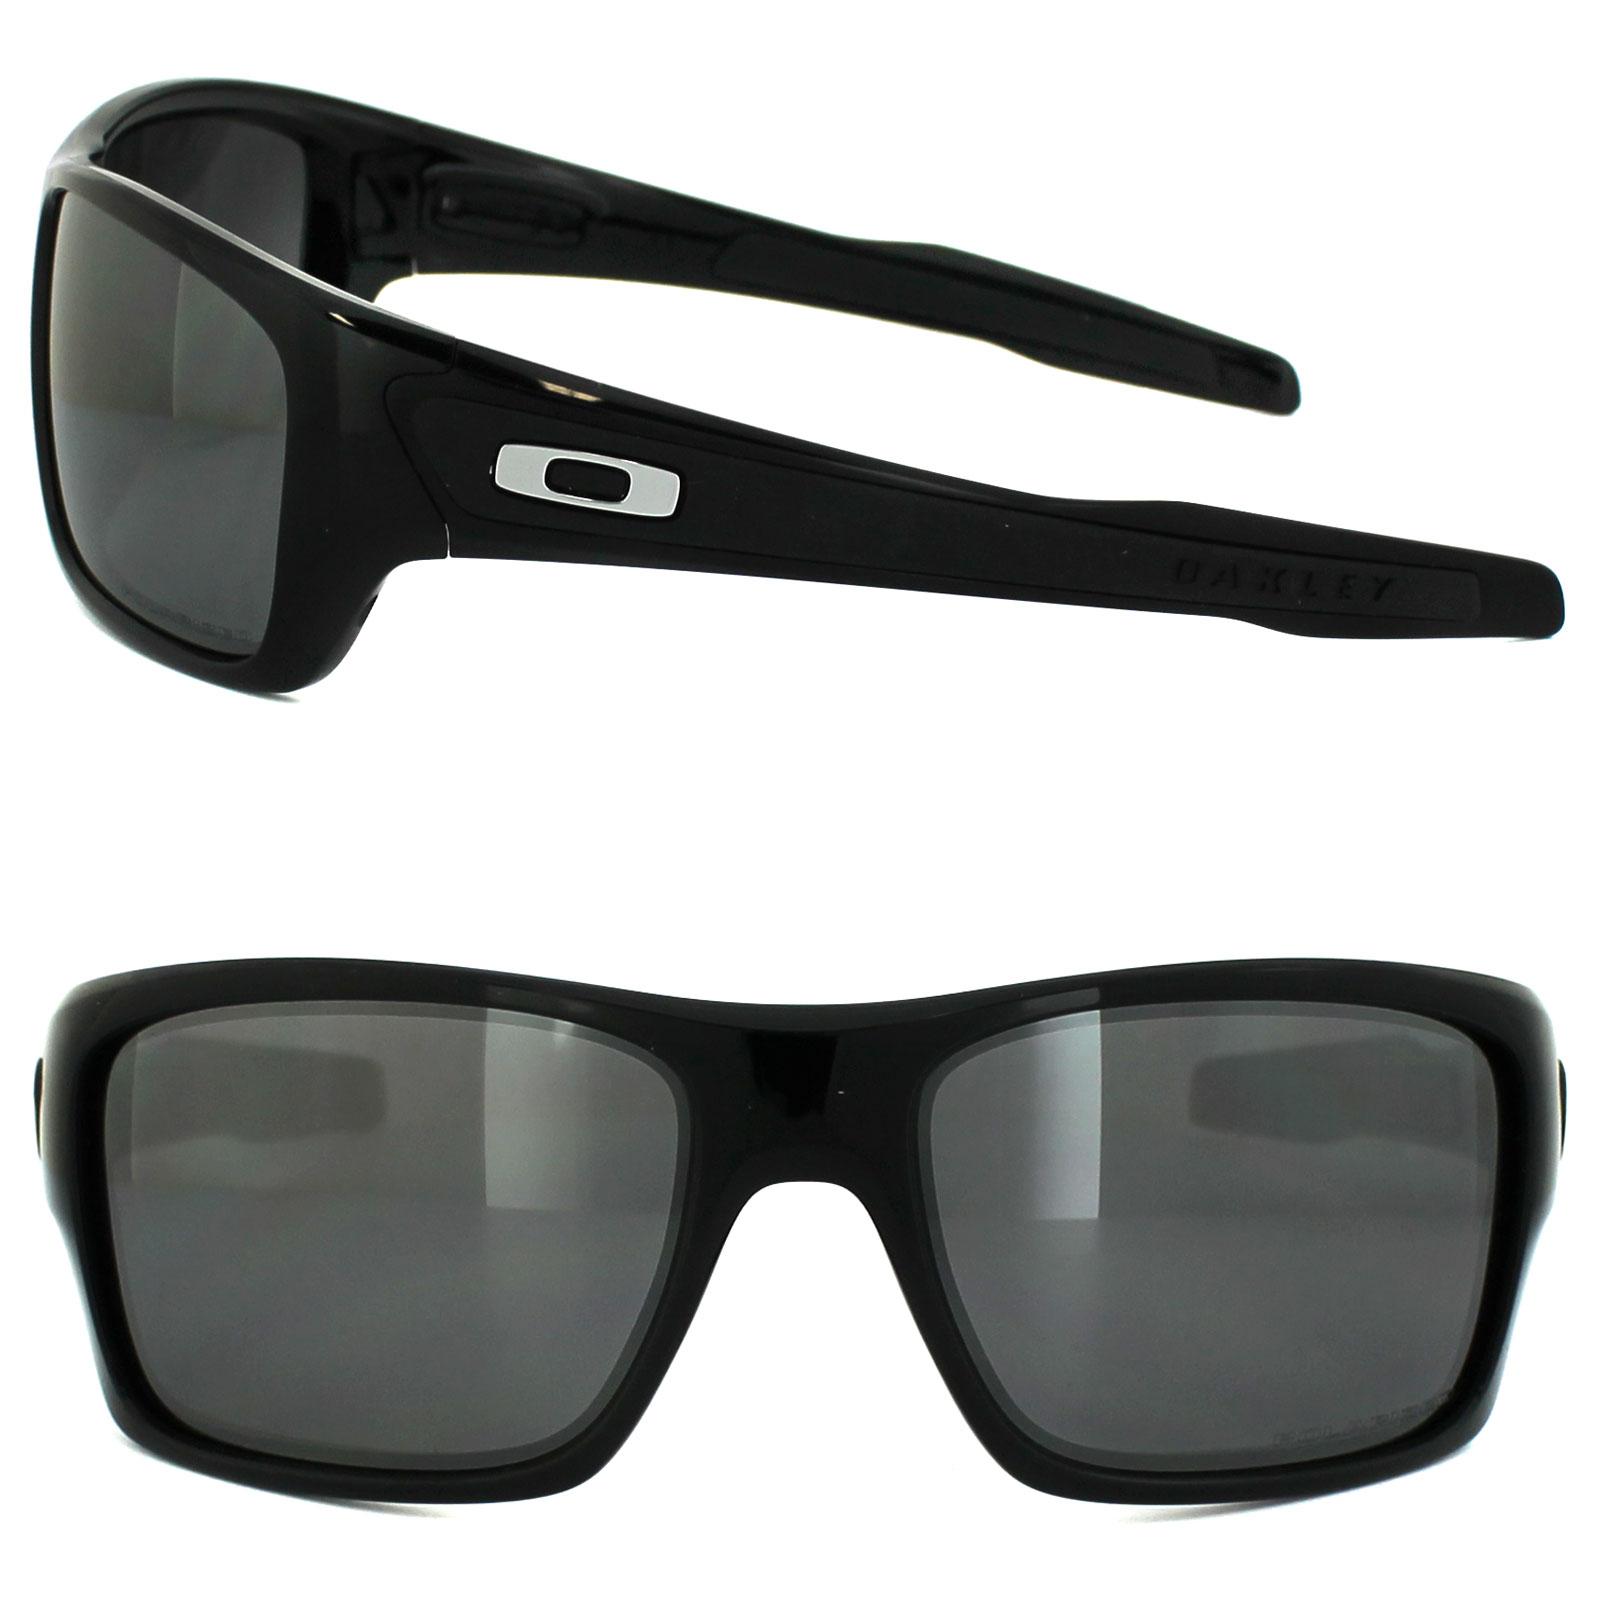 bf2153e259 Sentinel Oakley Sunglasses Turbine OO9263-08 Polished Black Black Iridium  Polarized